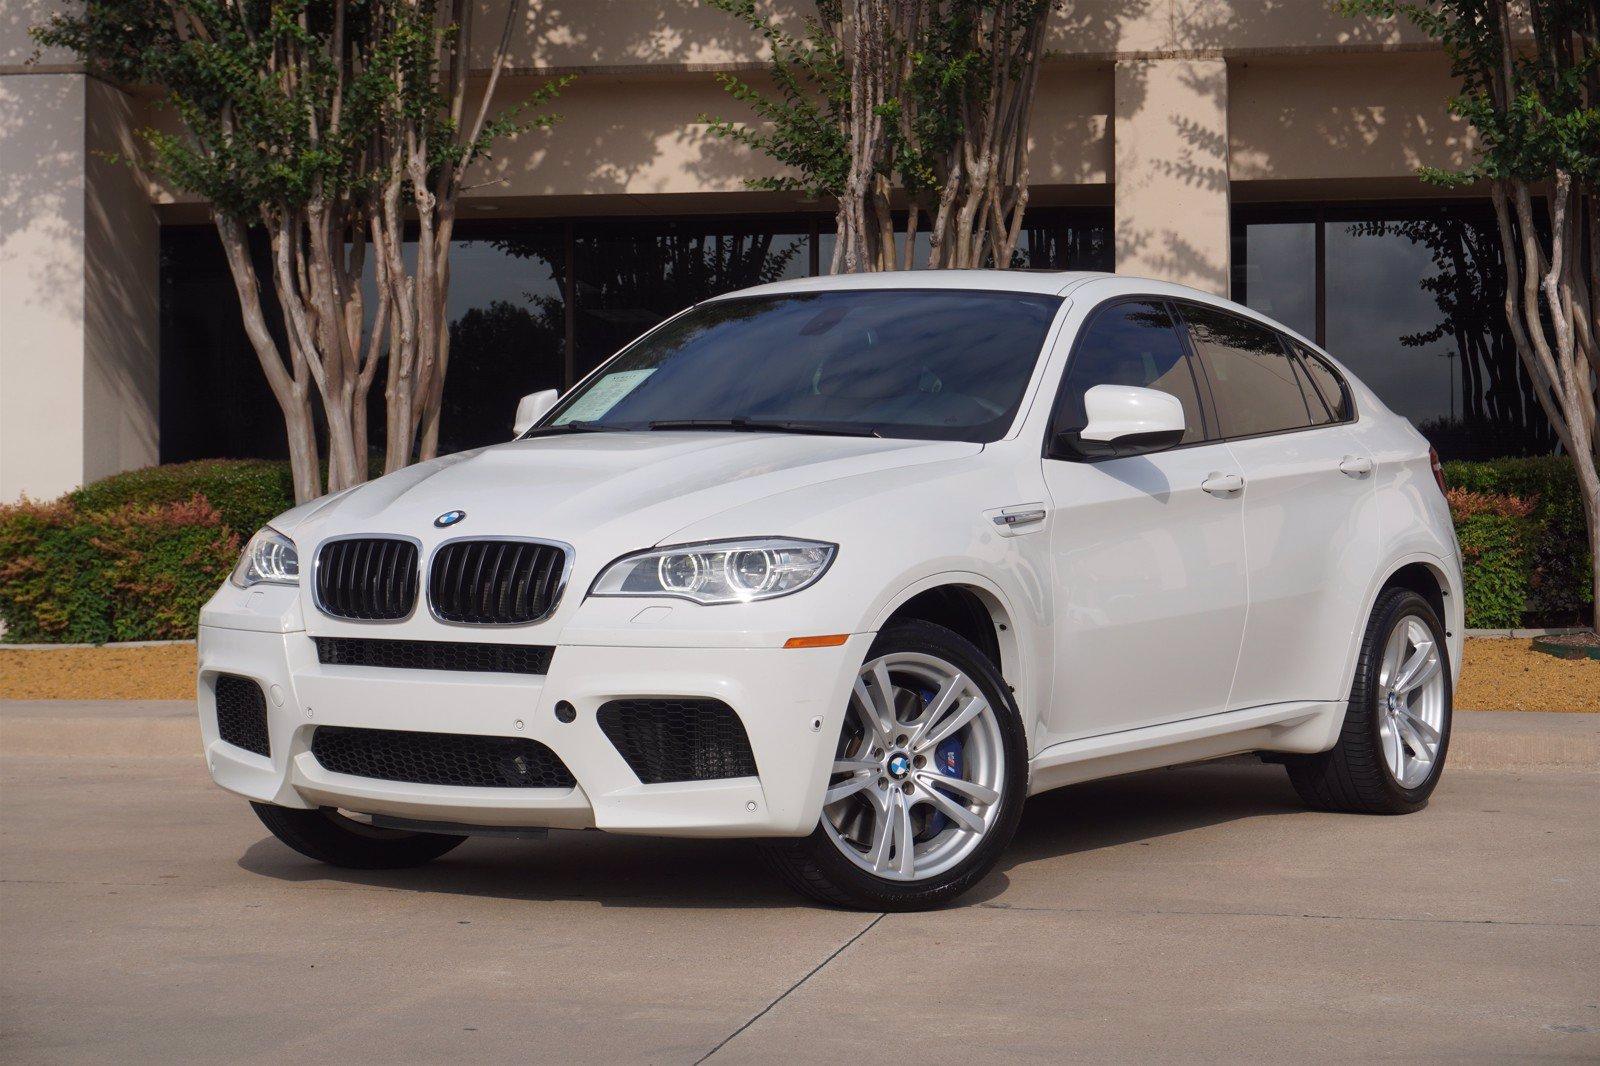 2014 BMW X6 M Vehicle Photo in Grapevine, TX 76051